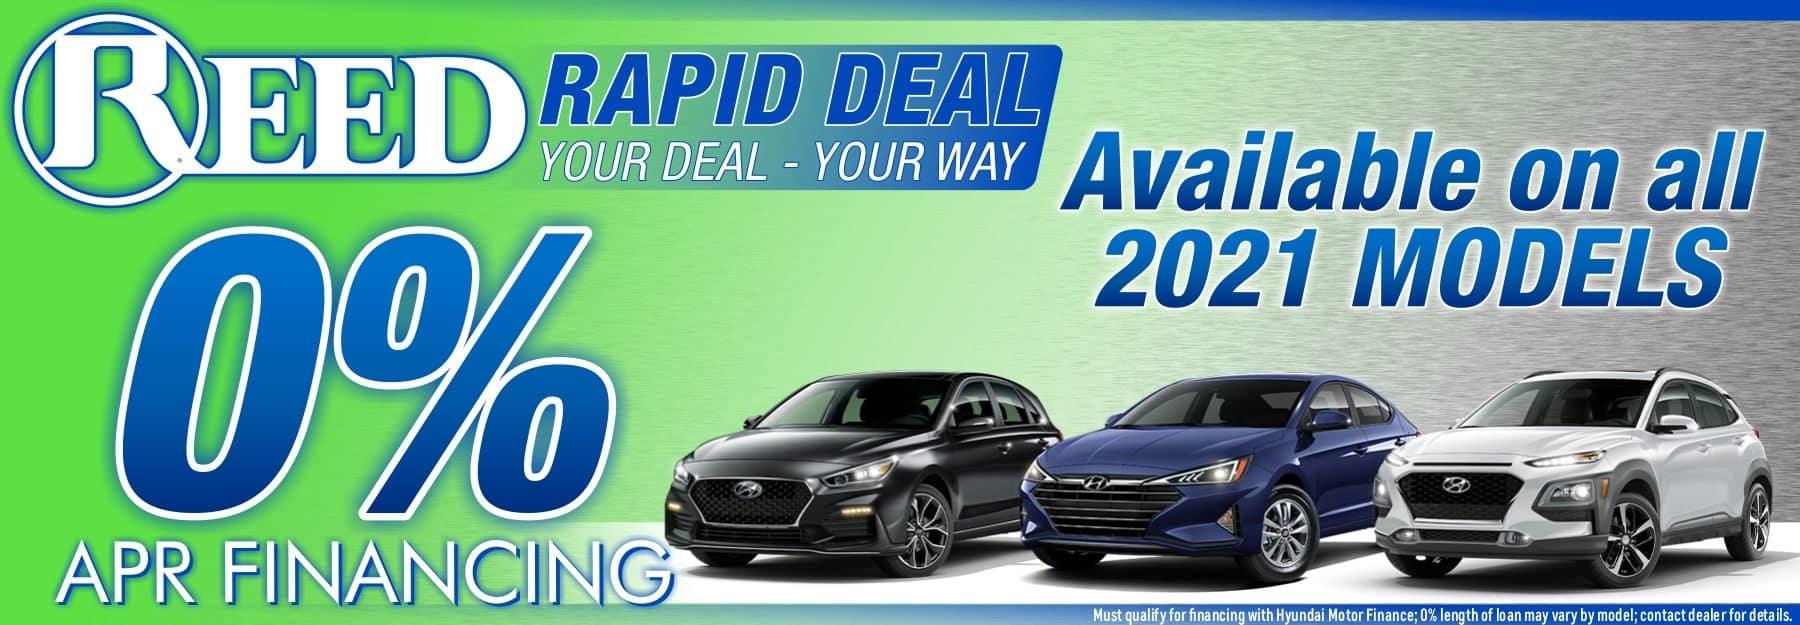 Hyundai KC ads JUNE 2021 new web